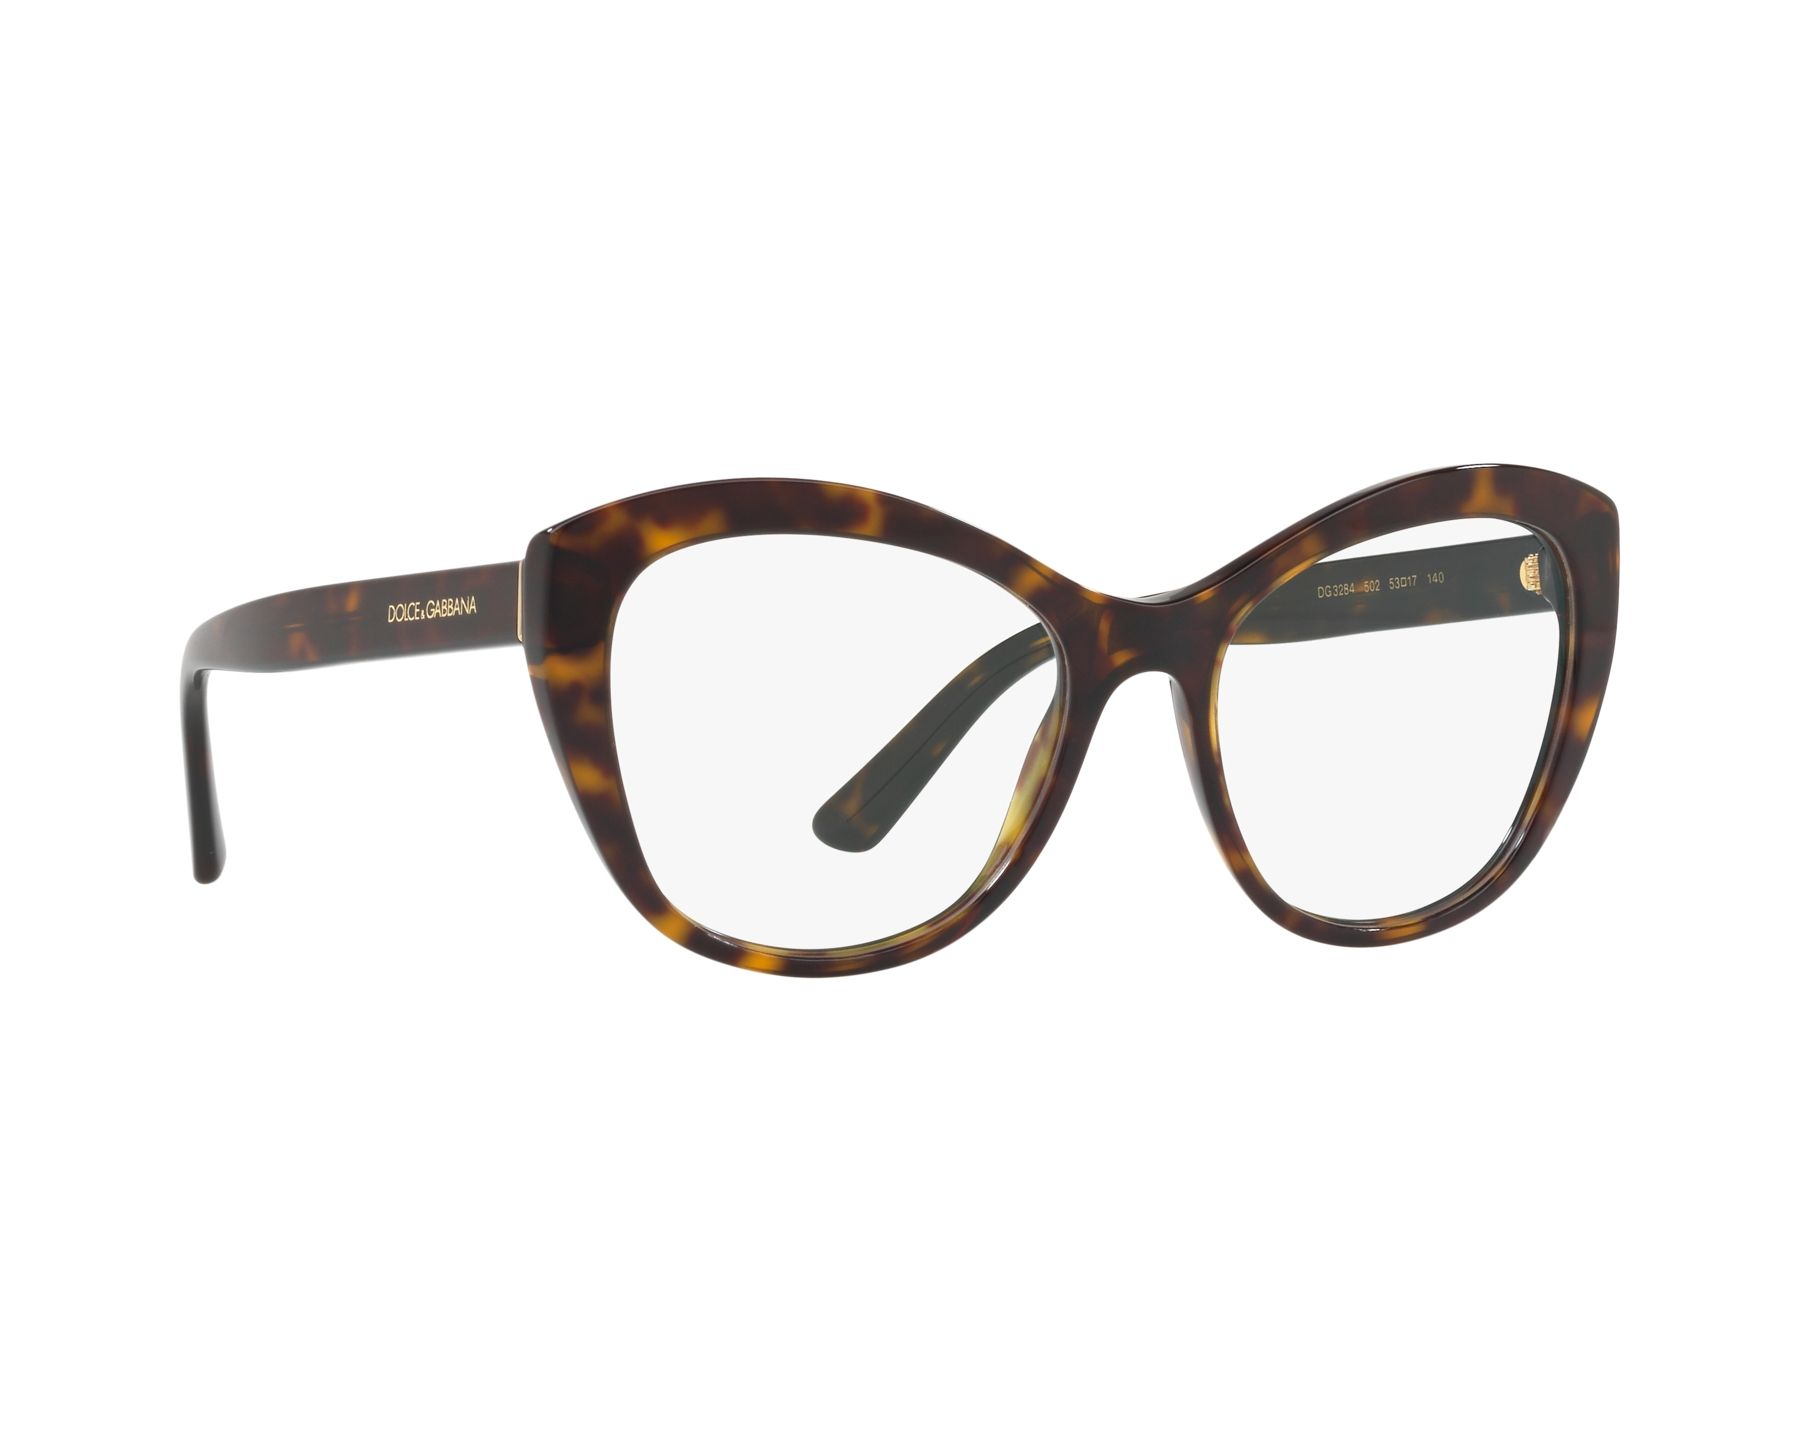 eyeglasses Dolce   Gabbana DG-3284 502 53-17 Havana 360 degree view 12 fa90ee0a39